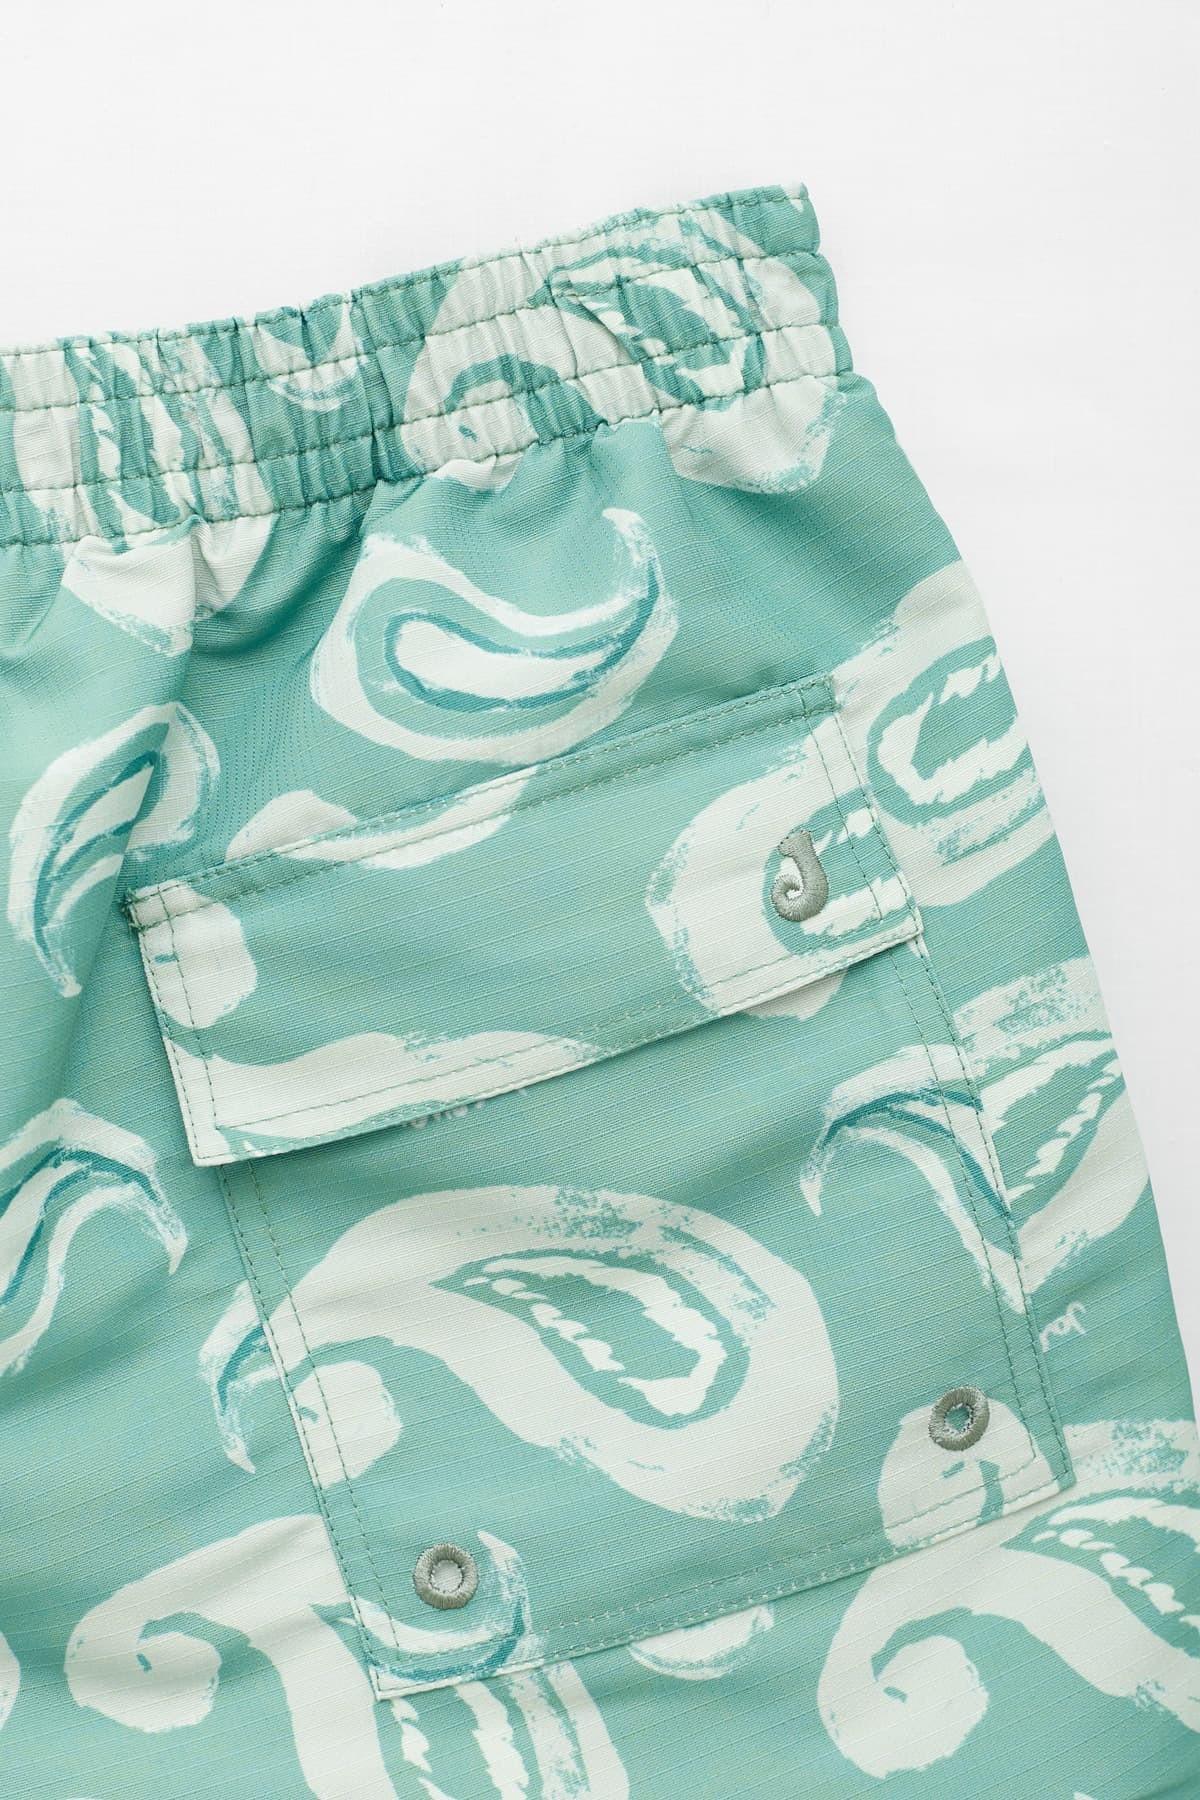 Comprar Sunnei Black Pocket Shirt